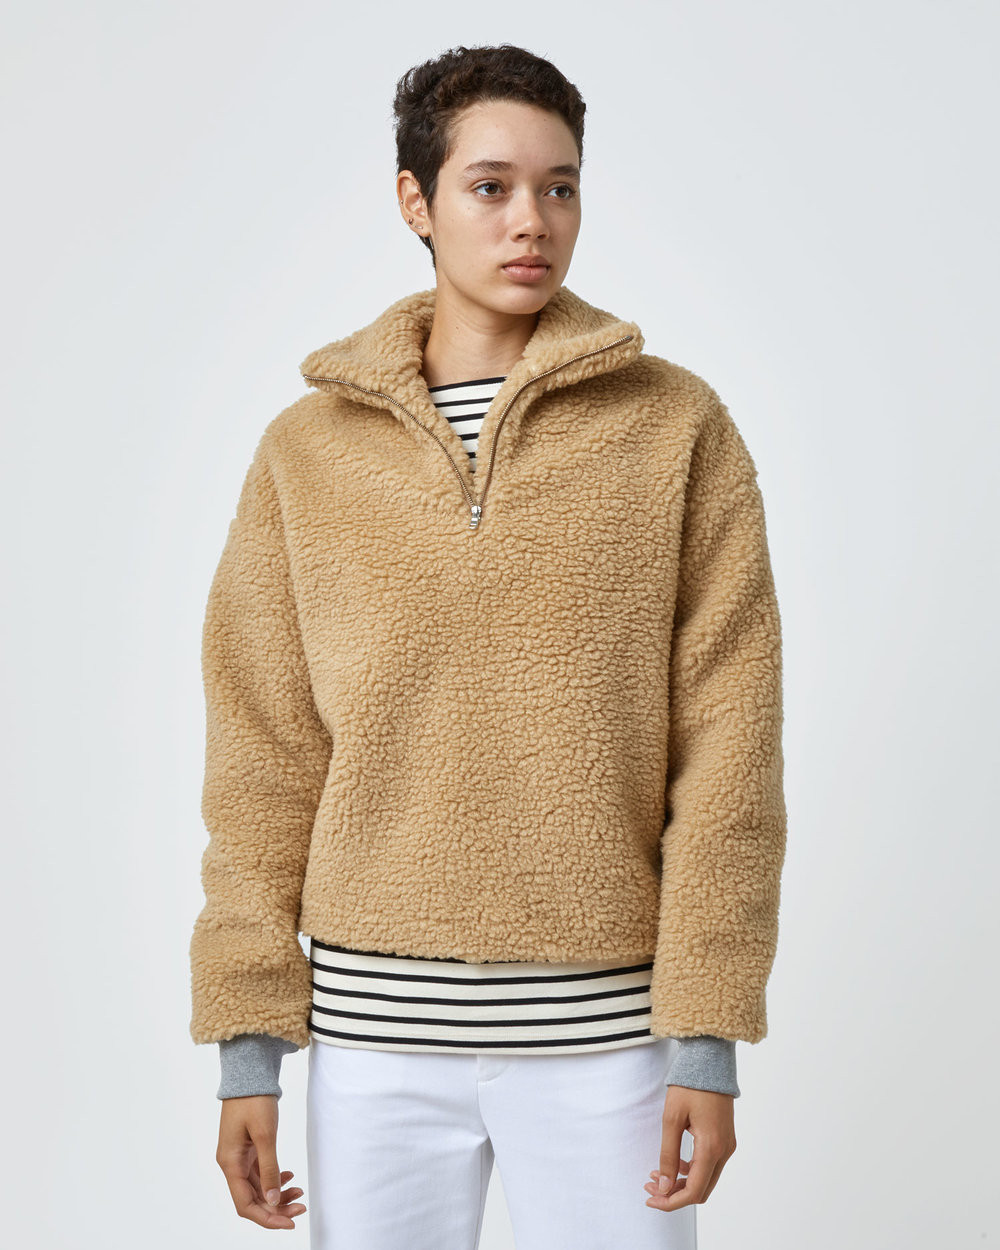 Shop One DNA Sherpa Fleece Half-zip in Camel with Gray Cuffs